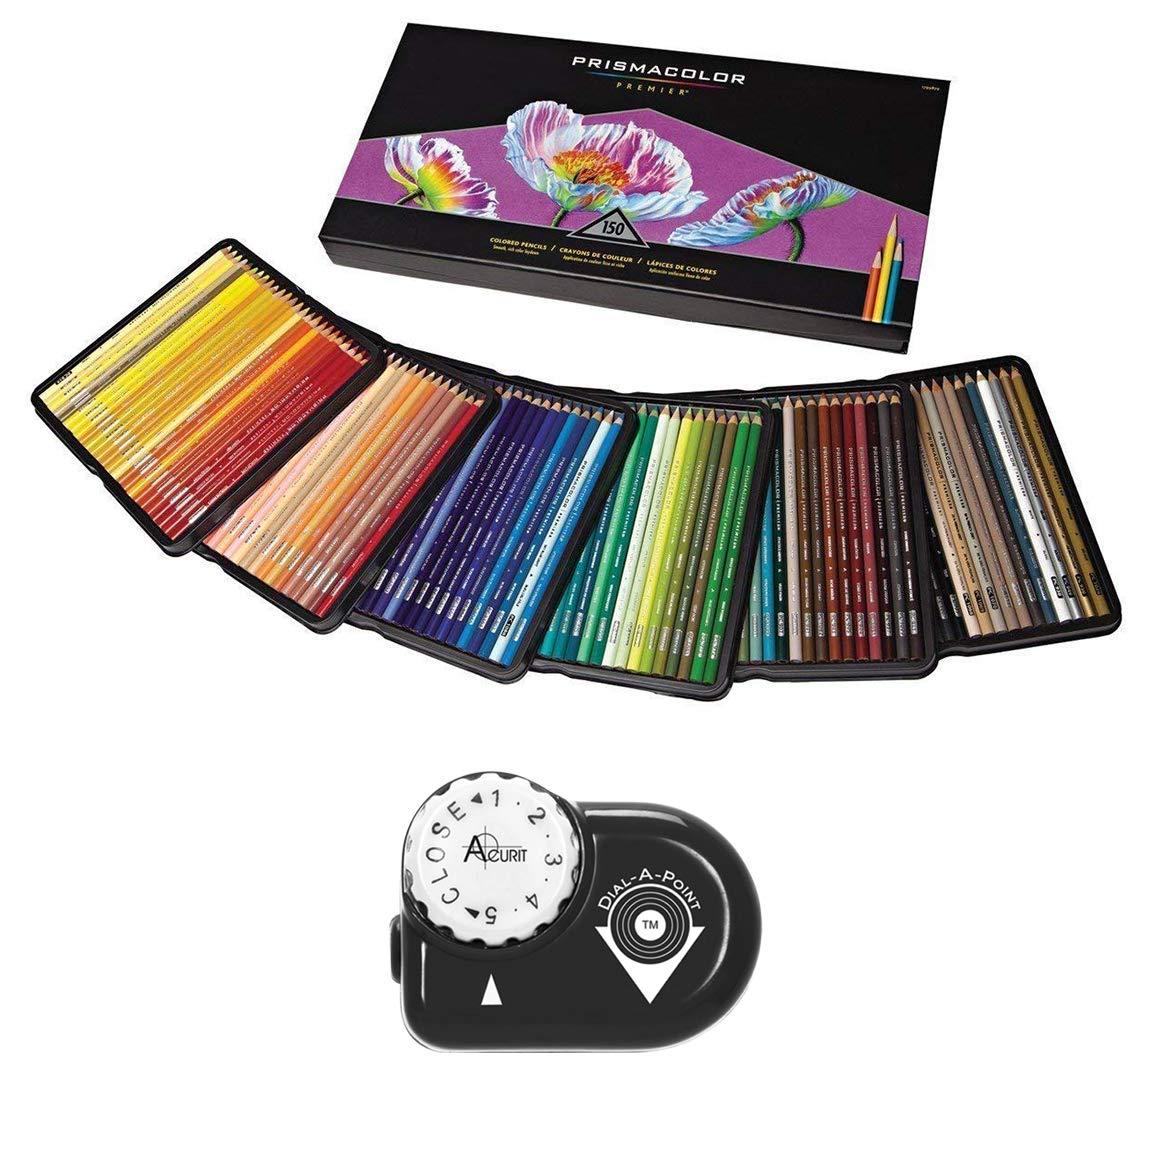 Prismacolor Colored Pencils Art Kit - Artist Premier Wooden Soft Core Pencils 150 ct. With Acurit Dial-a-Point Pencil Sharpener [151 pc. Set] by Prisamcolor